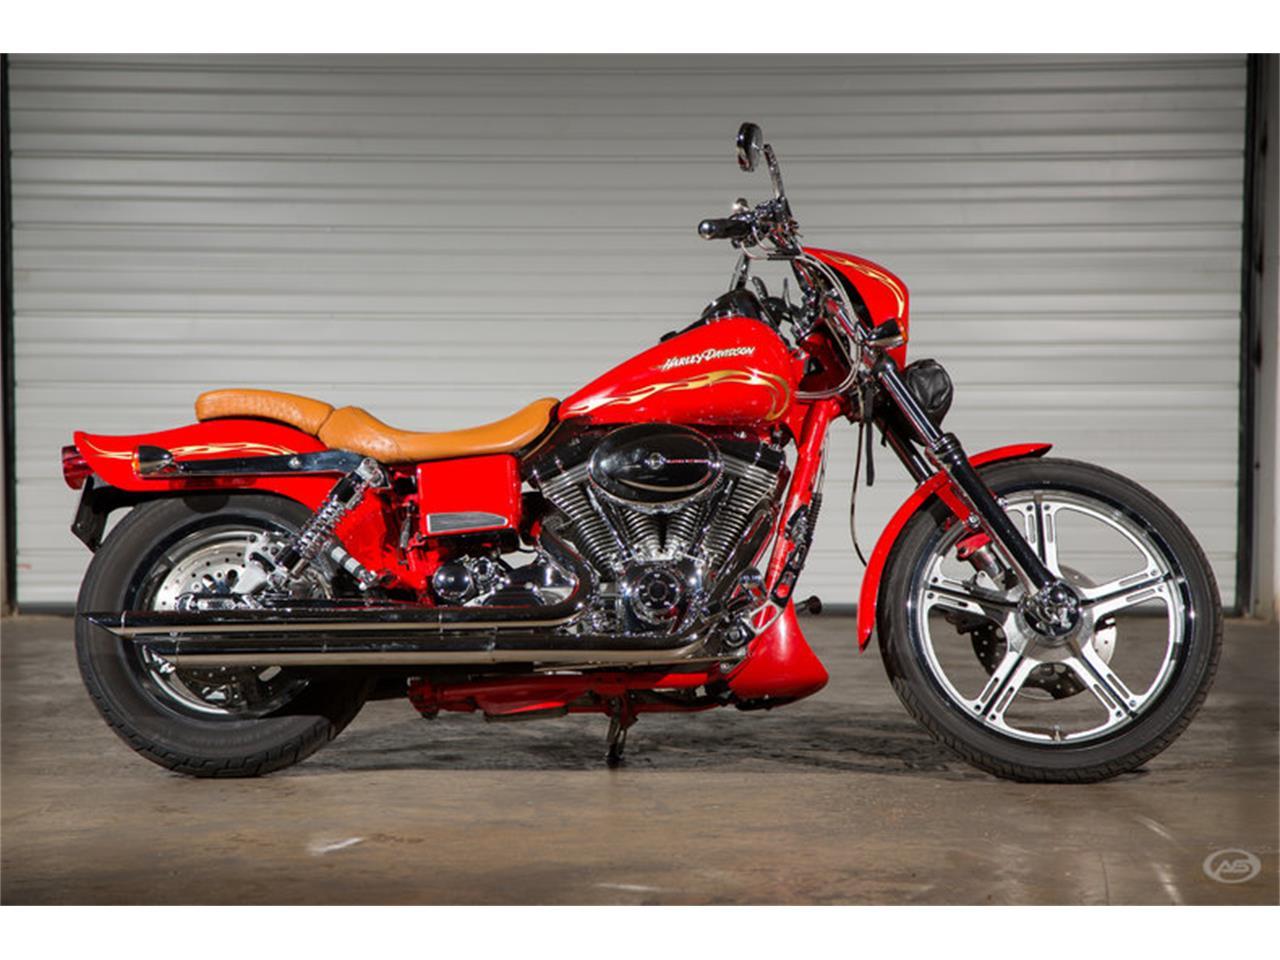 2001 Harley Davidson Fxdwg2 Wide Glide Cvo Switchblade For Sale Classiccars Com Cc 886778